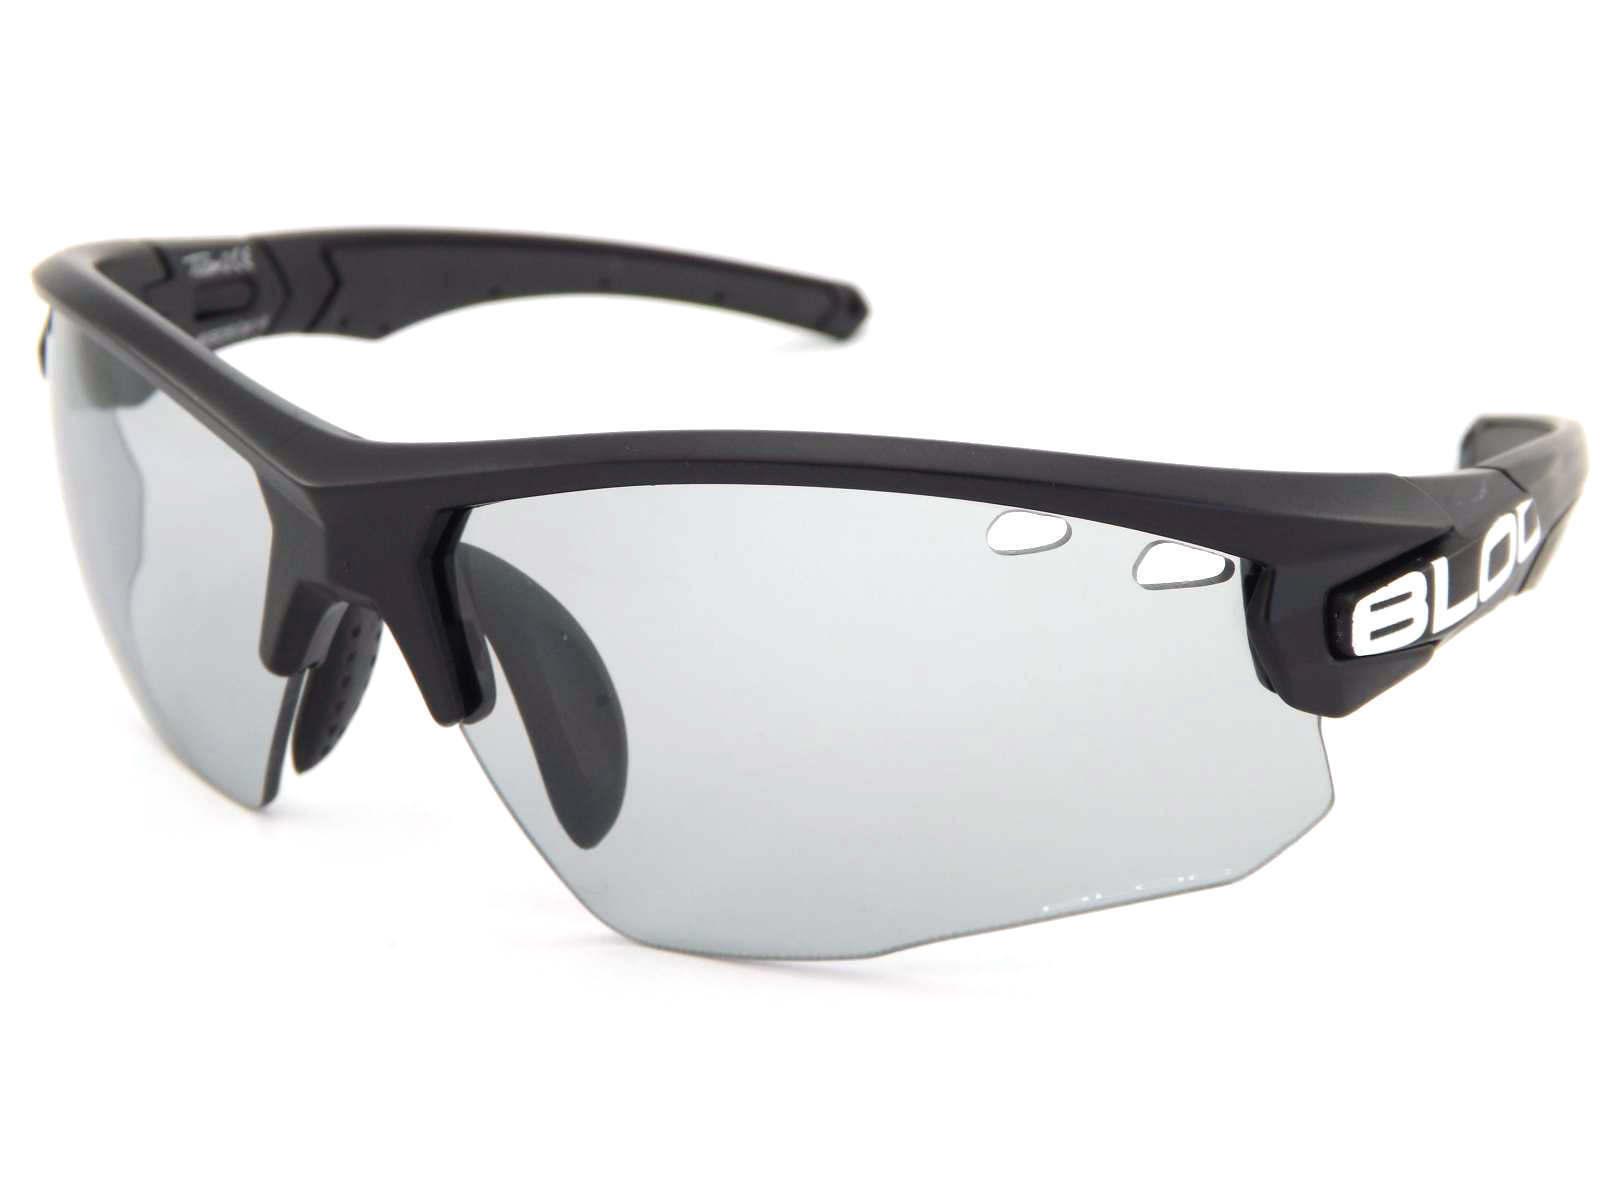 a332abe5e5c5 BLOC light reactive TITAN sports Sunglasses Black/ Grey Photochromic ...